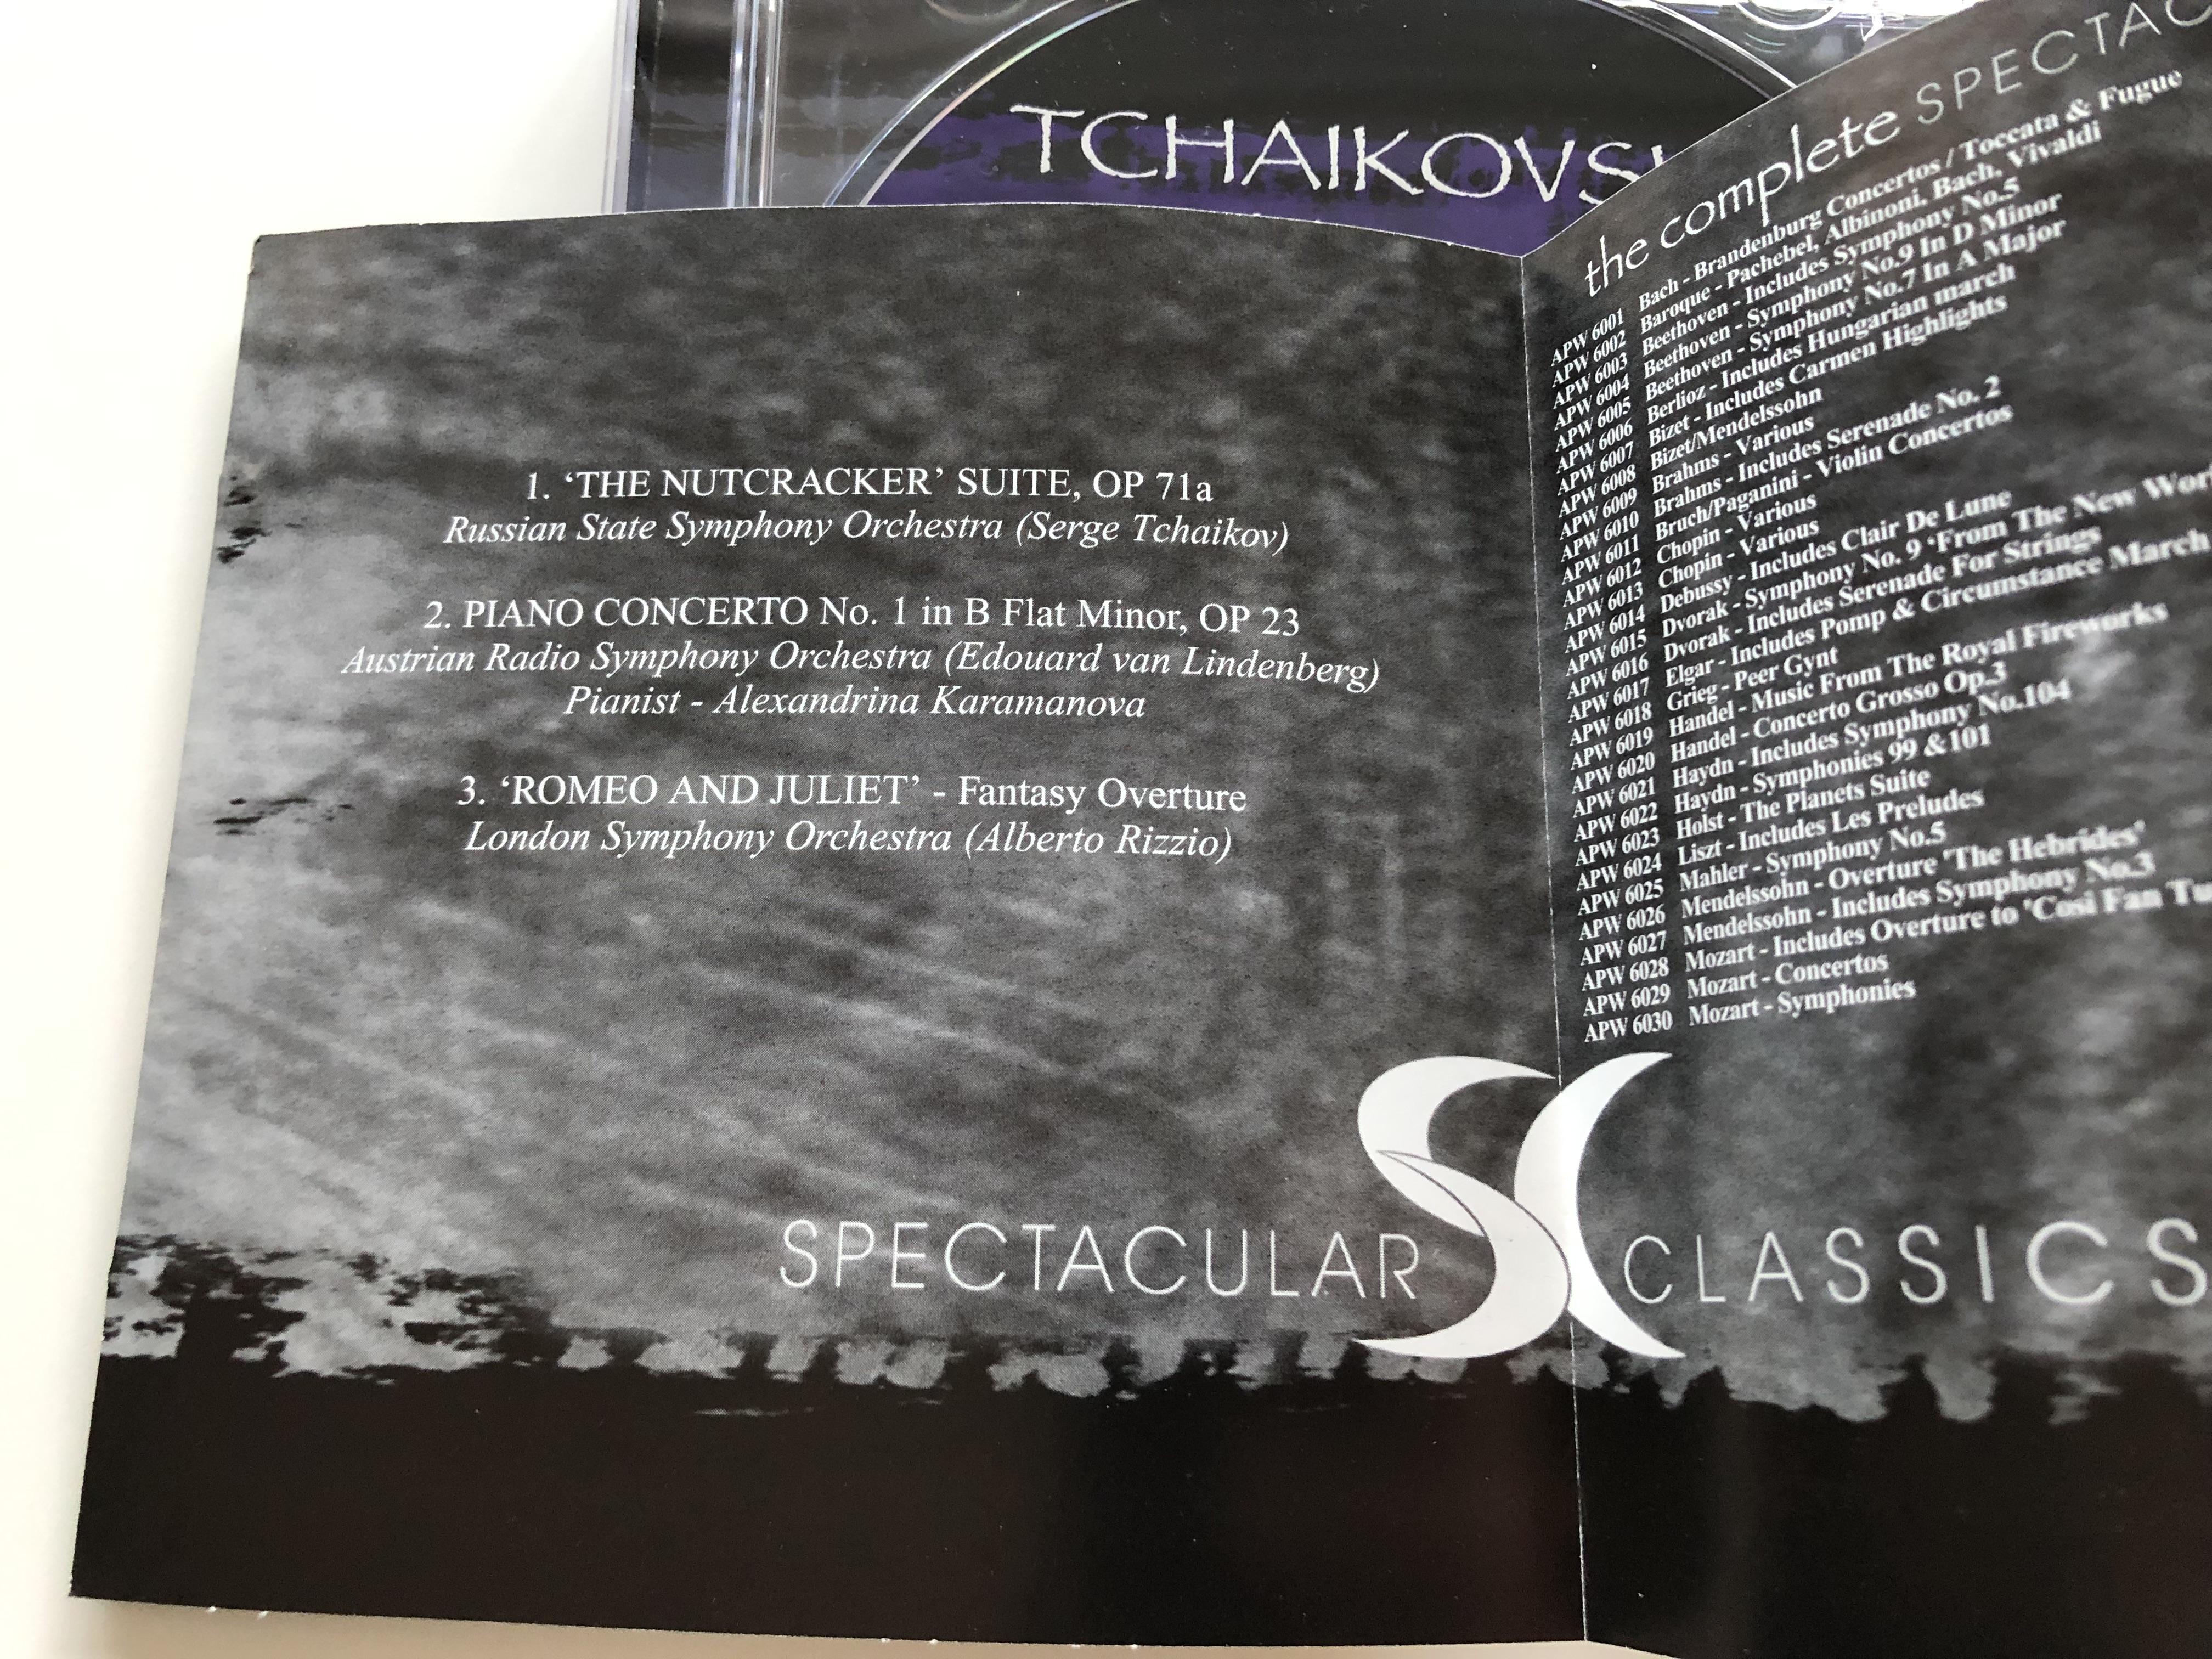 tchaikovsky-spectacular-classicsimg-2522.jpg